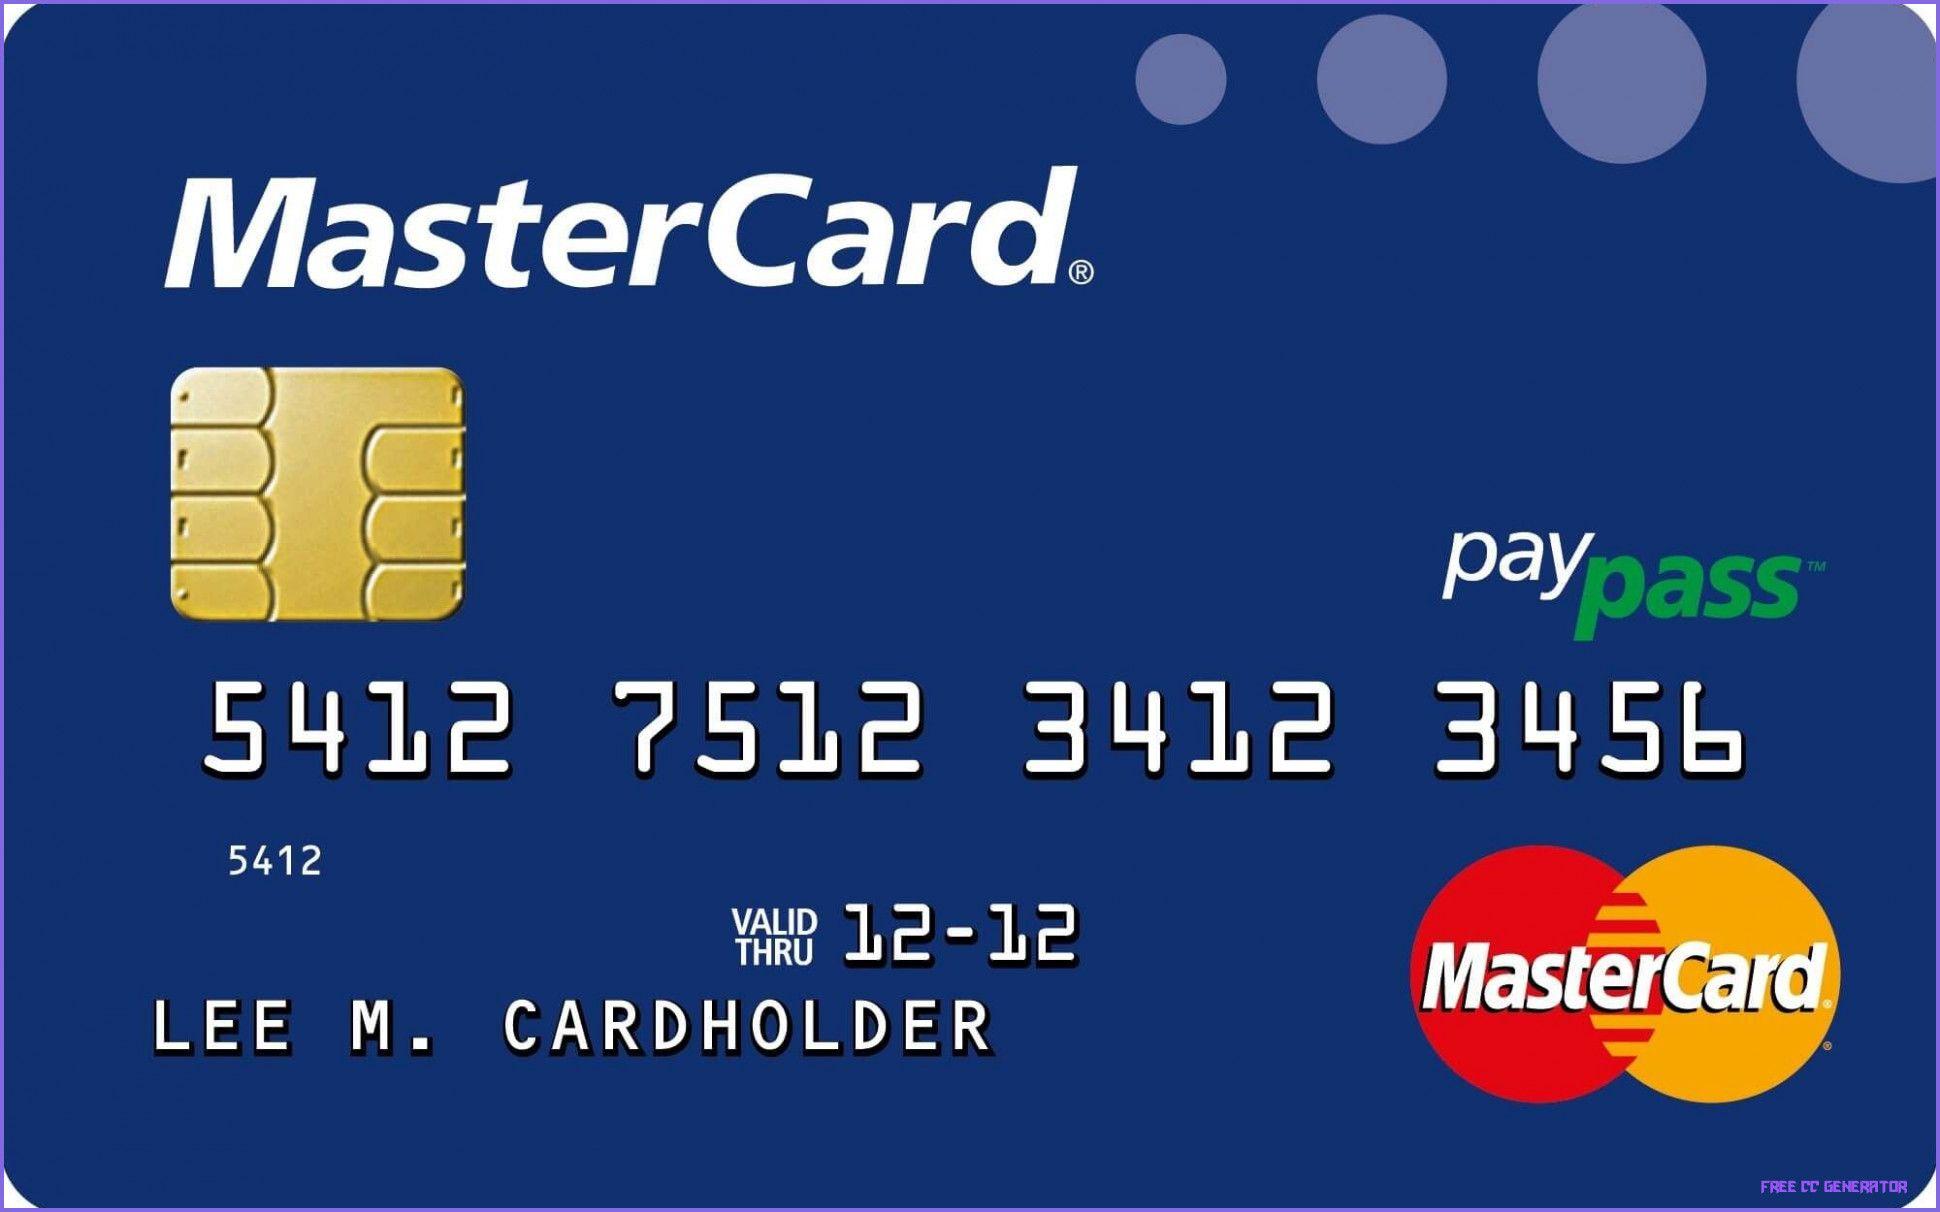 Kreditkarten generator ᐅ Germany / Deutschland Fake Name  Free